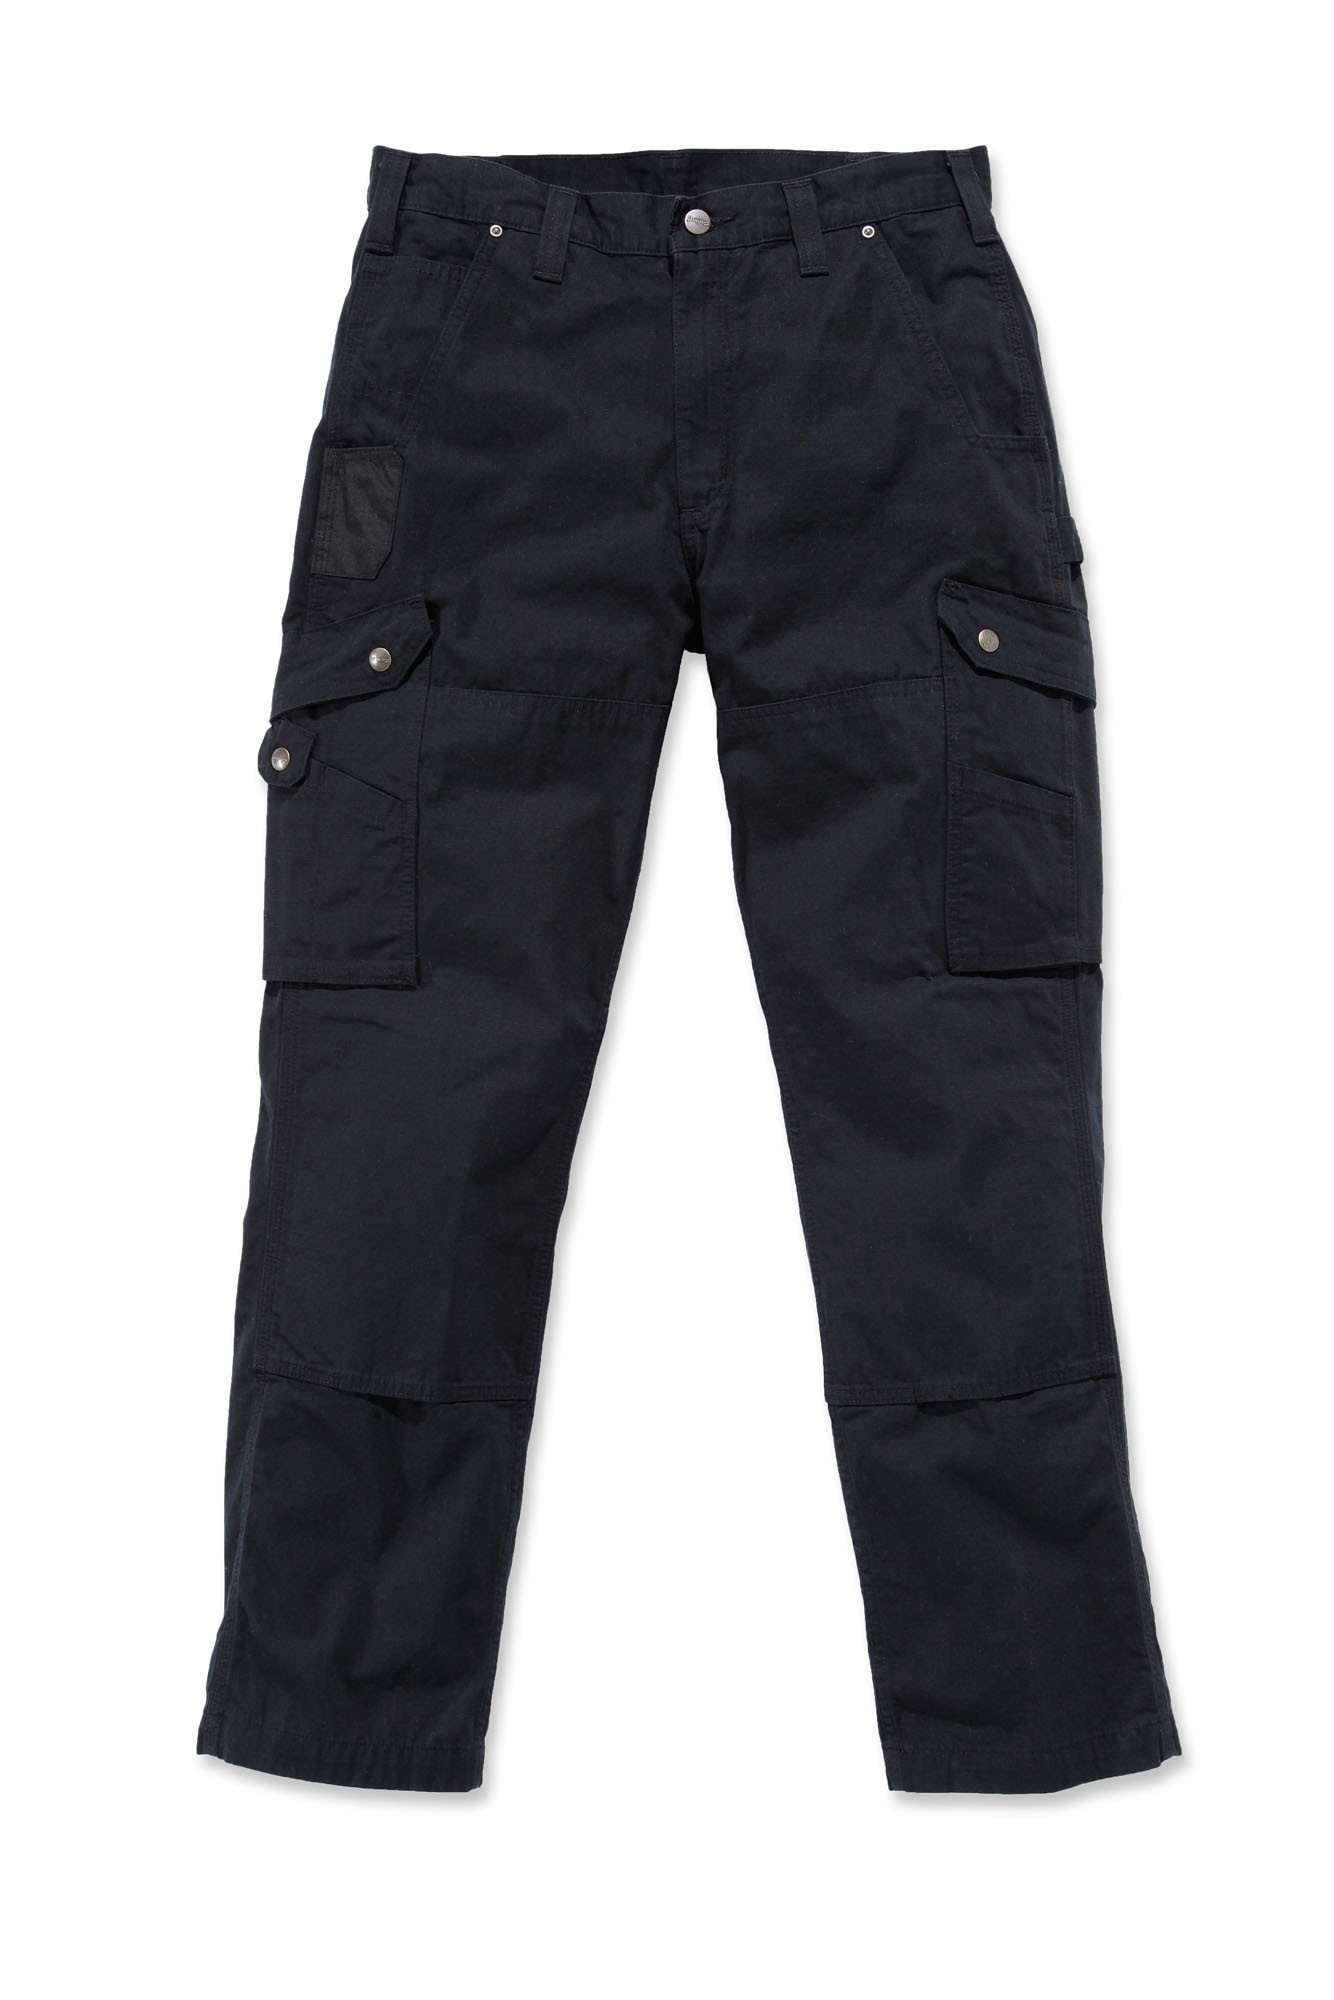 Carhartt Ripstop Cargo Pant : Black